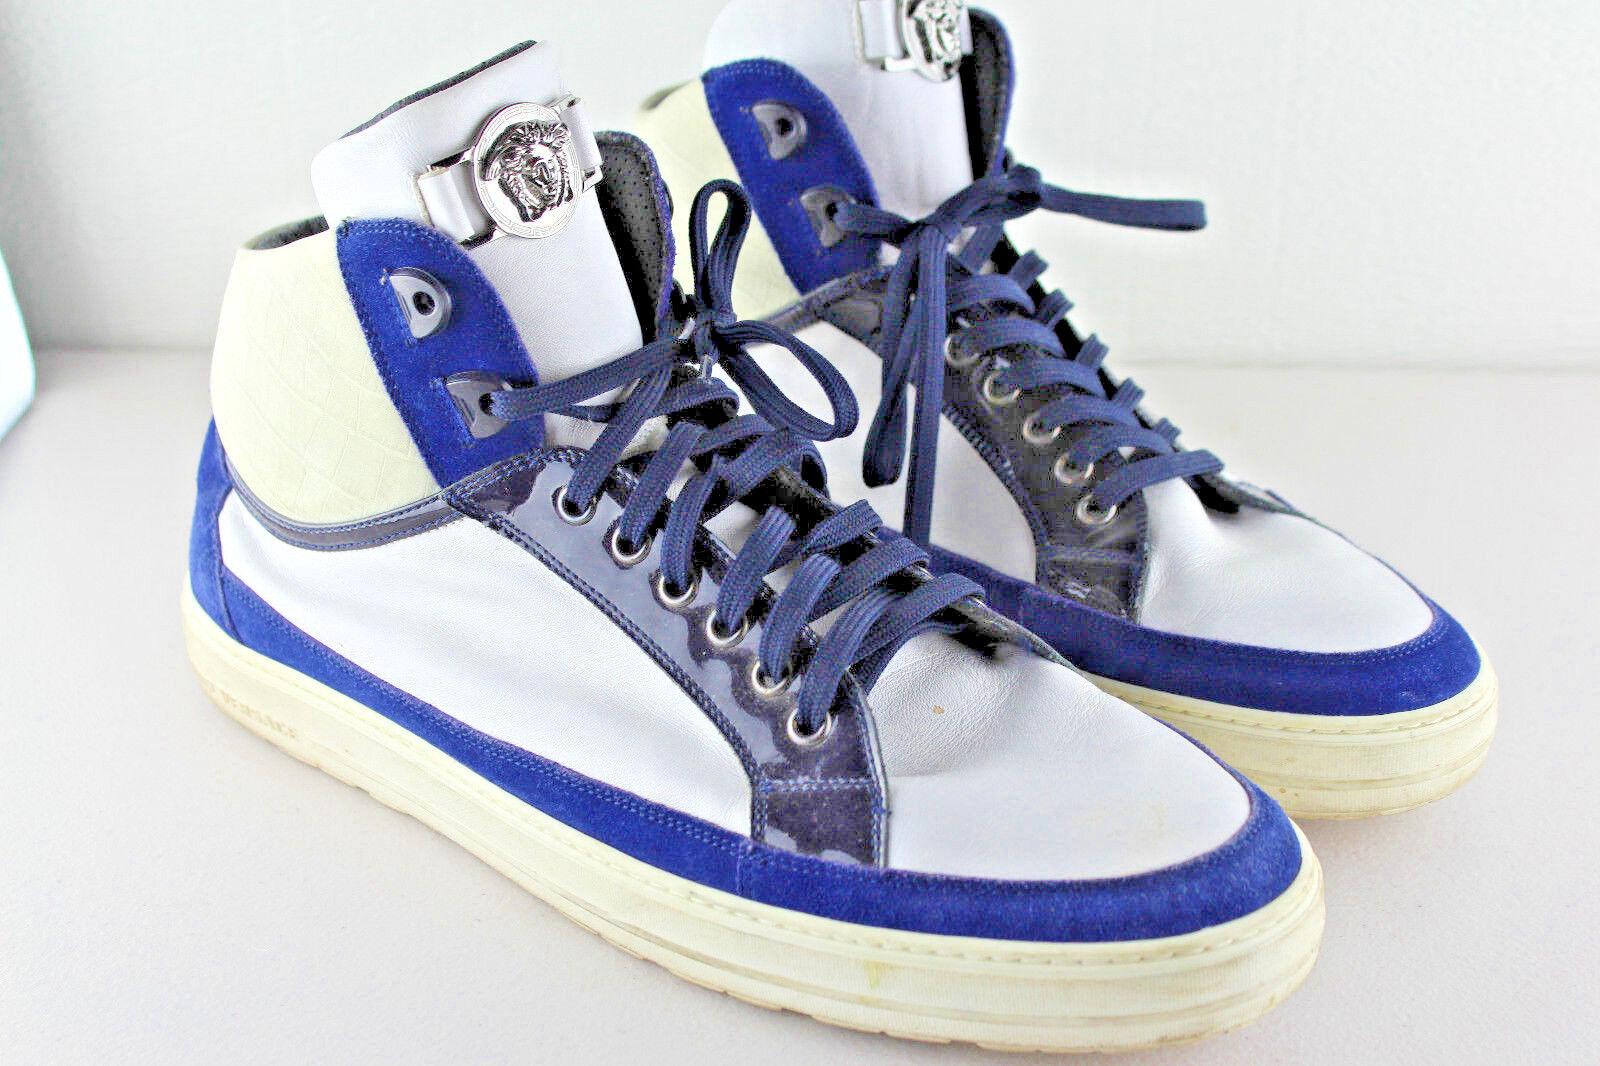 Versace piel blanca Amarillo Ante Plata Tono Medusa High Top Top High Sneaker Sz 45 US 12 d98233